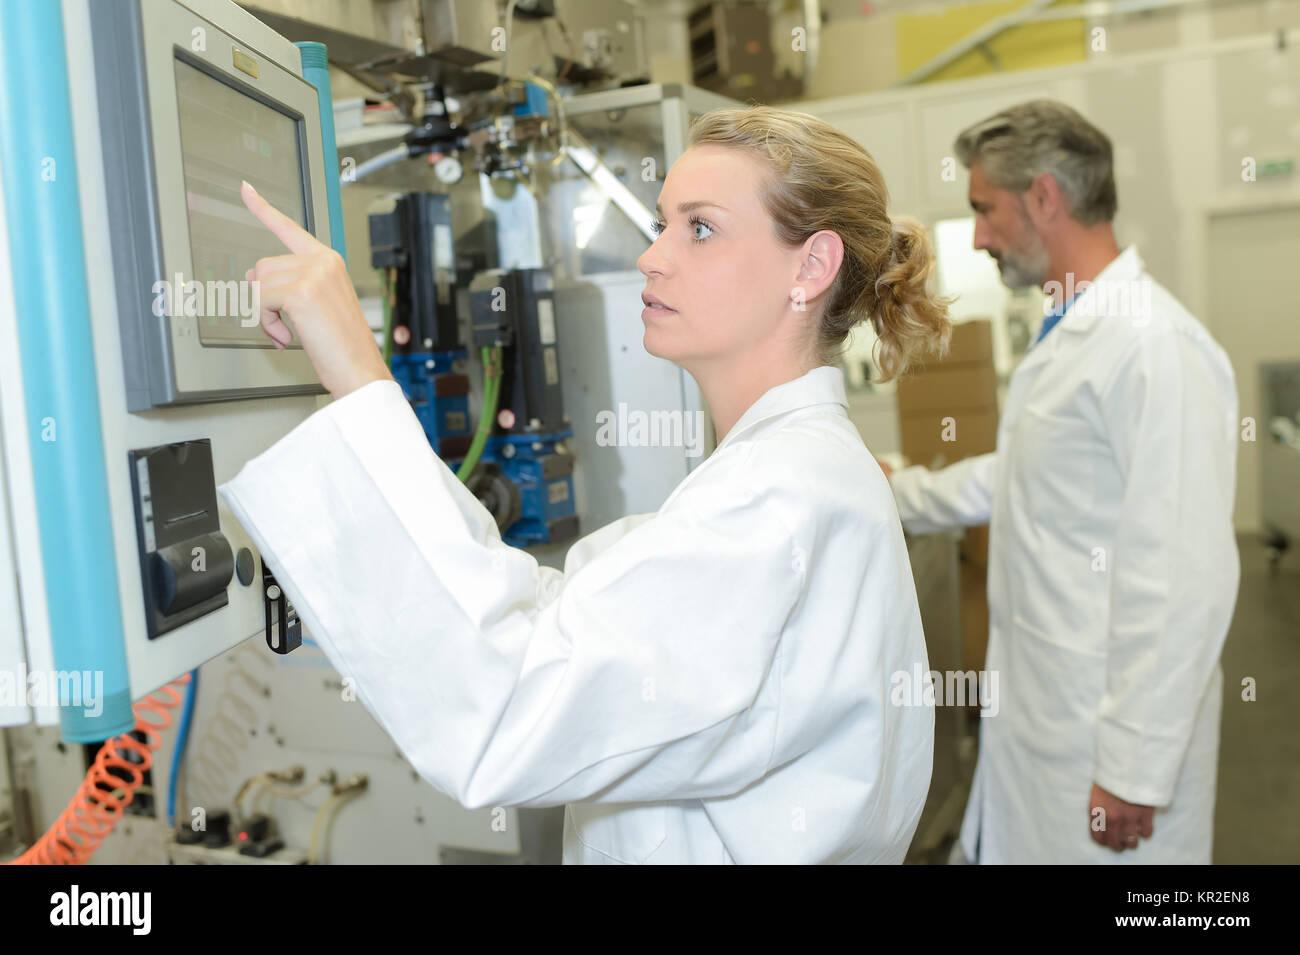 adjusting the machine - Stock Image